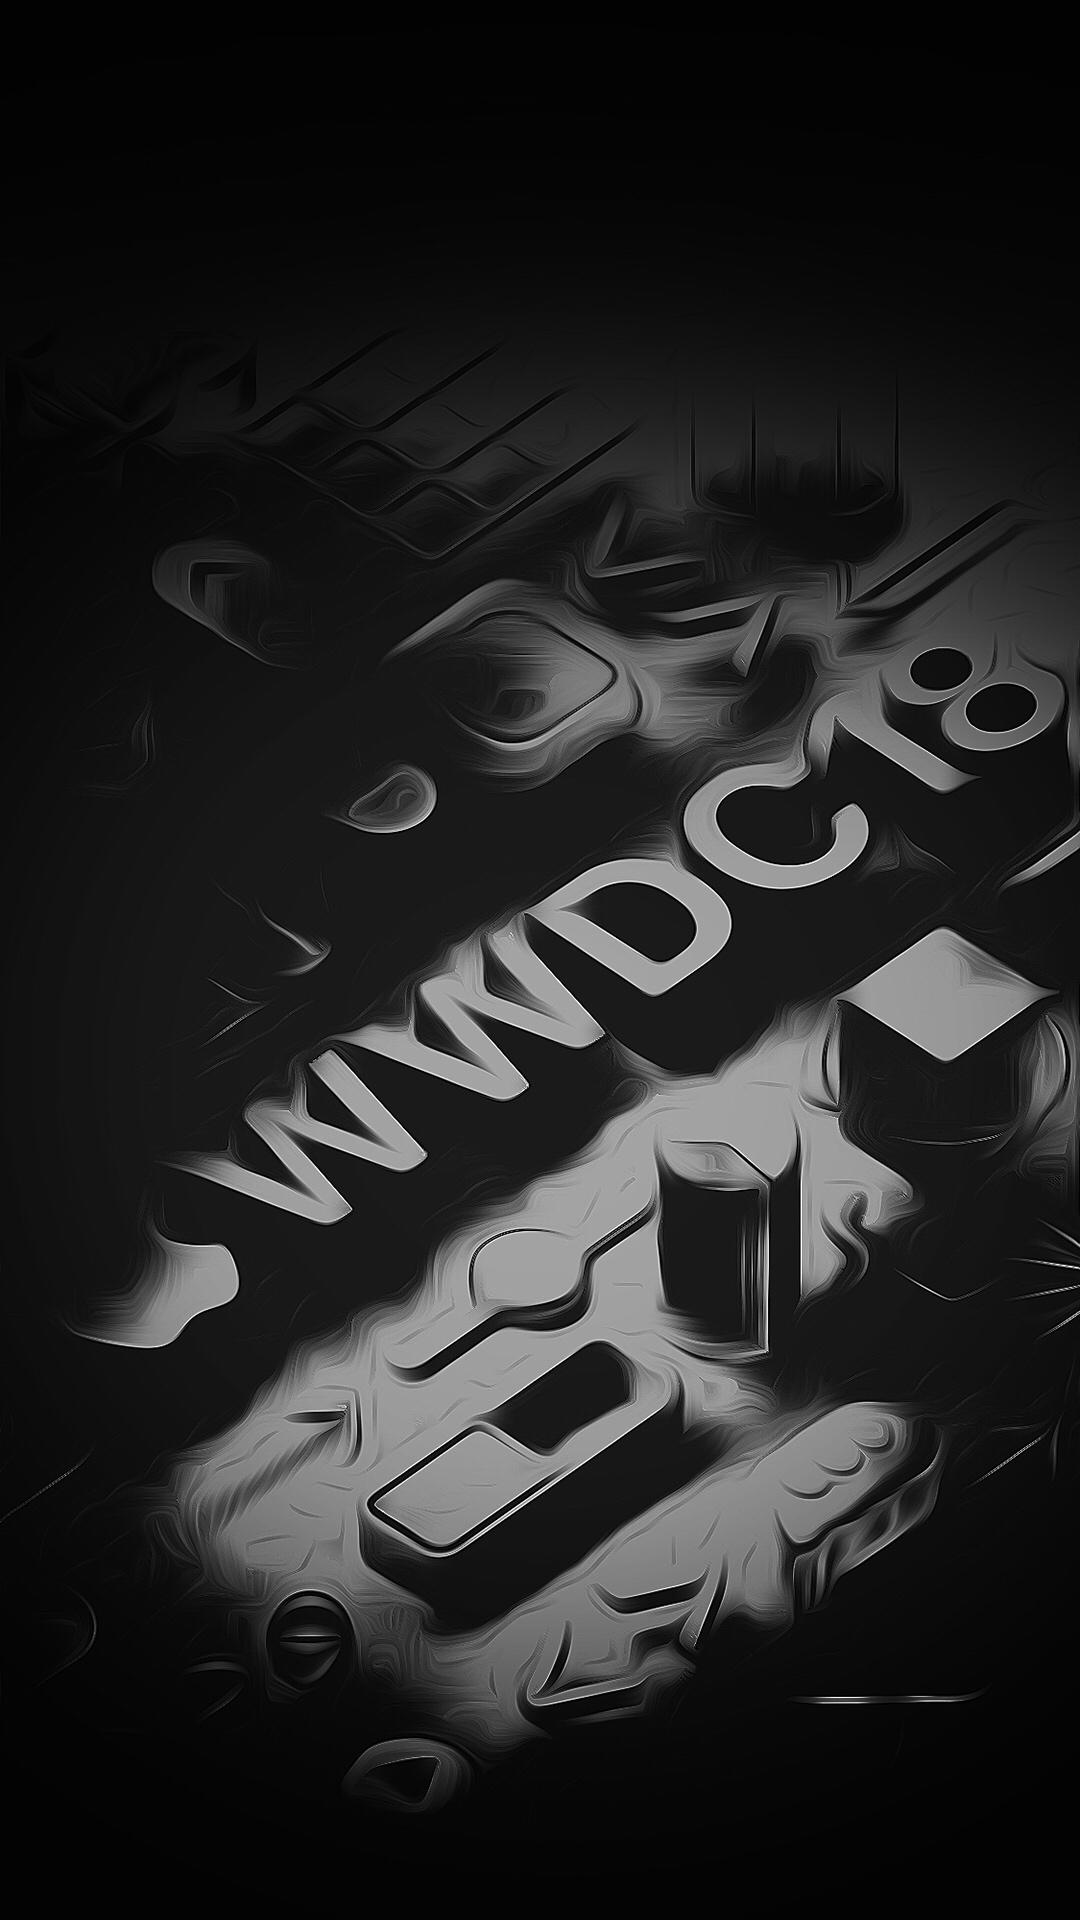 iPhone wallpaper wwdc18 black WWDC18